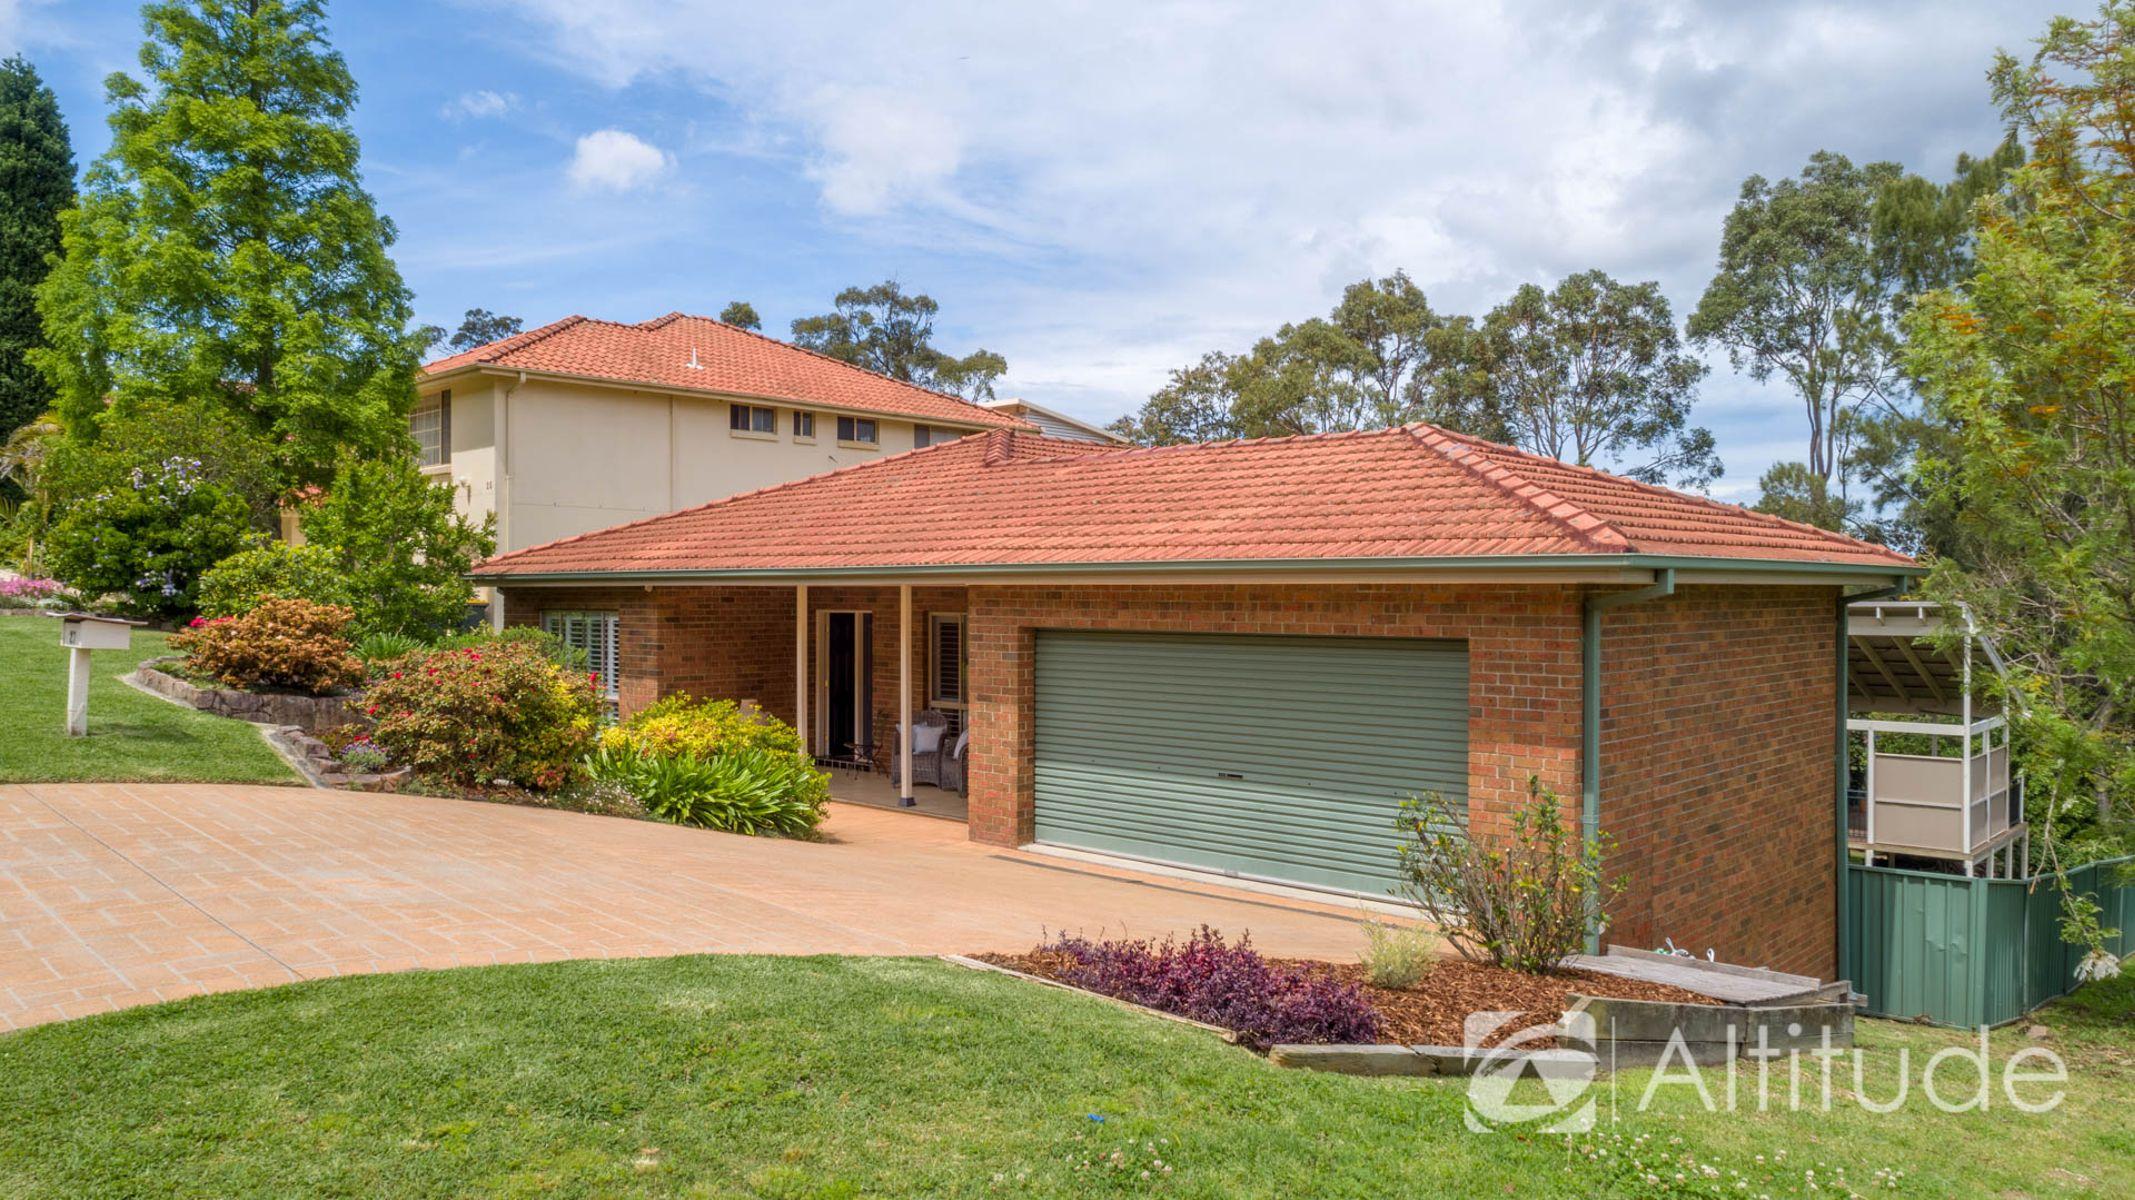 27 Woodside Dr, Eleebana NSW 2282, Australia, House for Sale